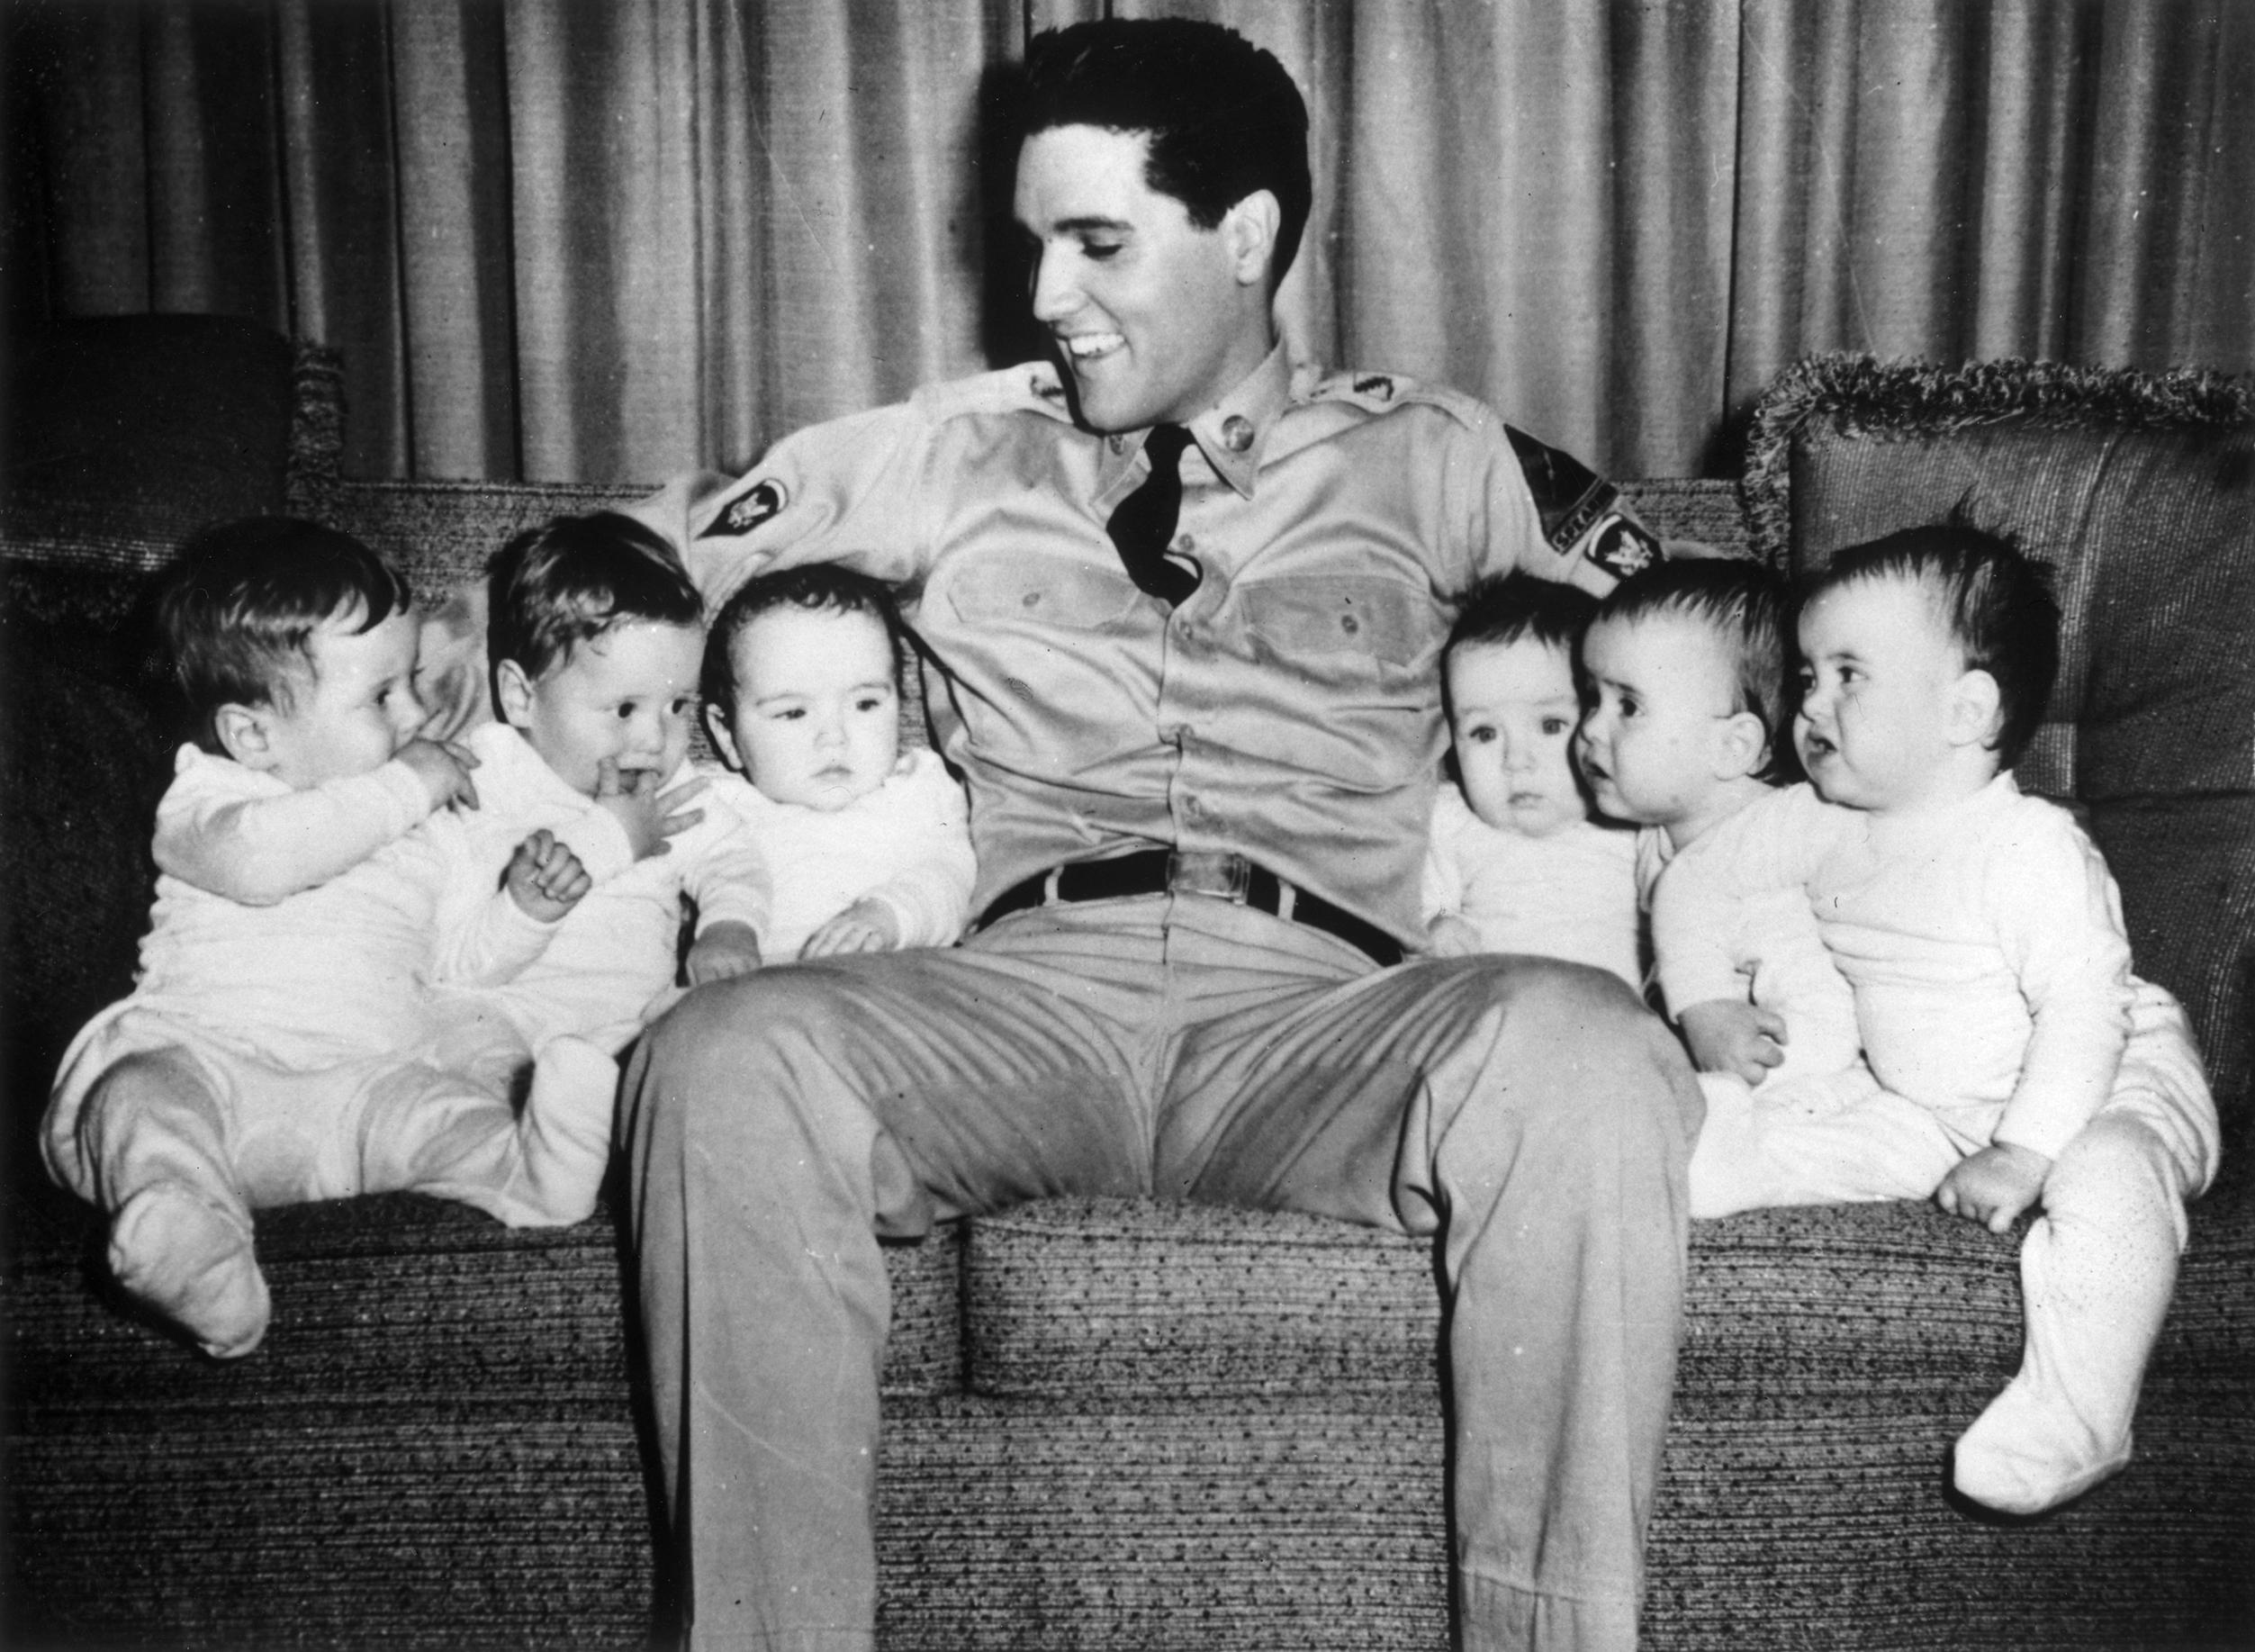 GI Blues : 1960, Elvis on set with six babies (three sets of twins).